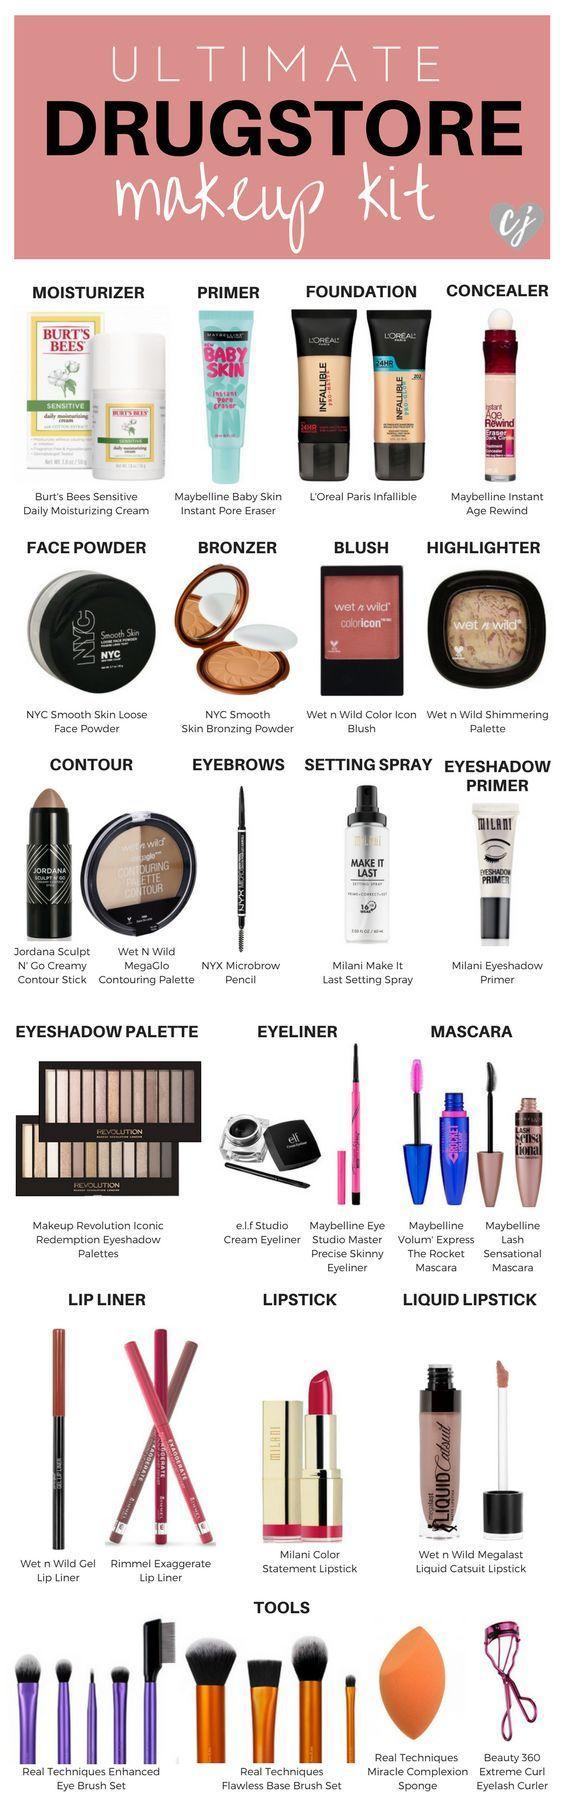 Ultimate Drugstore Makeup Kit - Creativity Jar